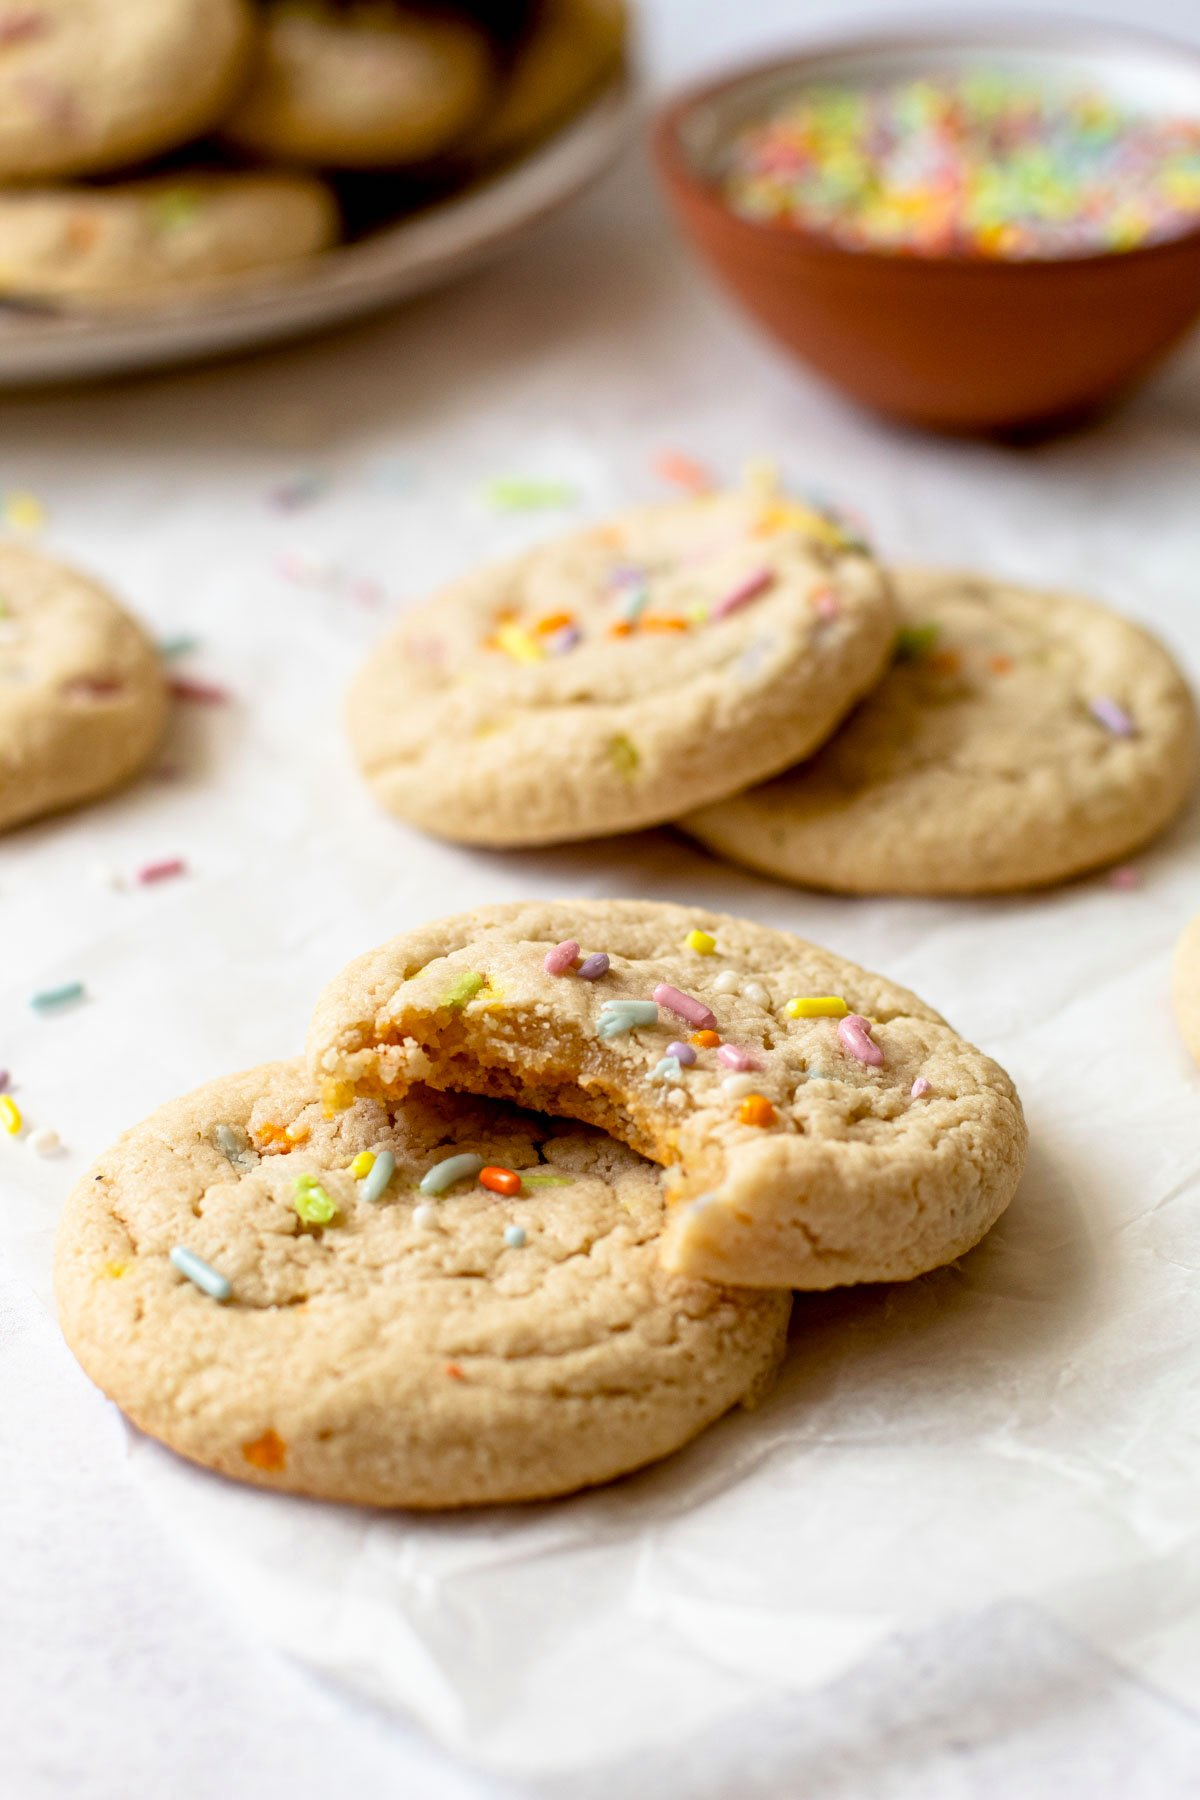 Gluten-Free Funfetti cookies.